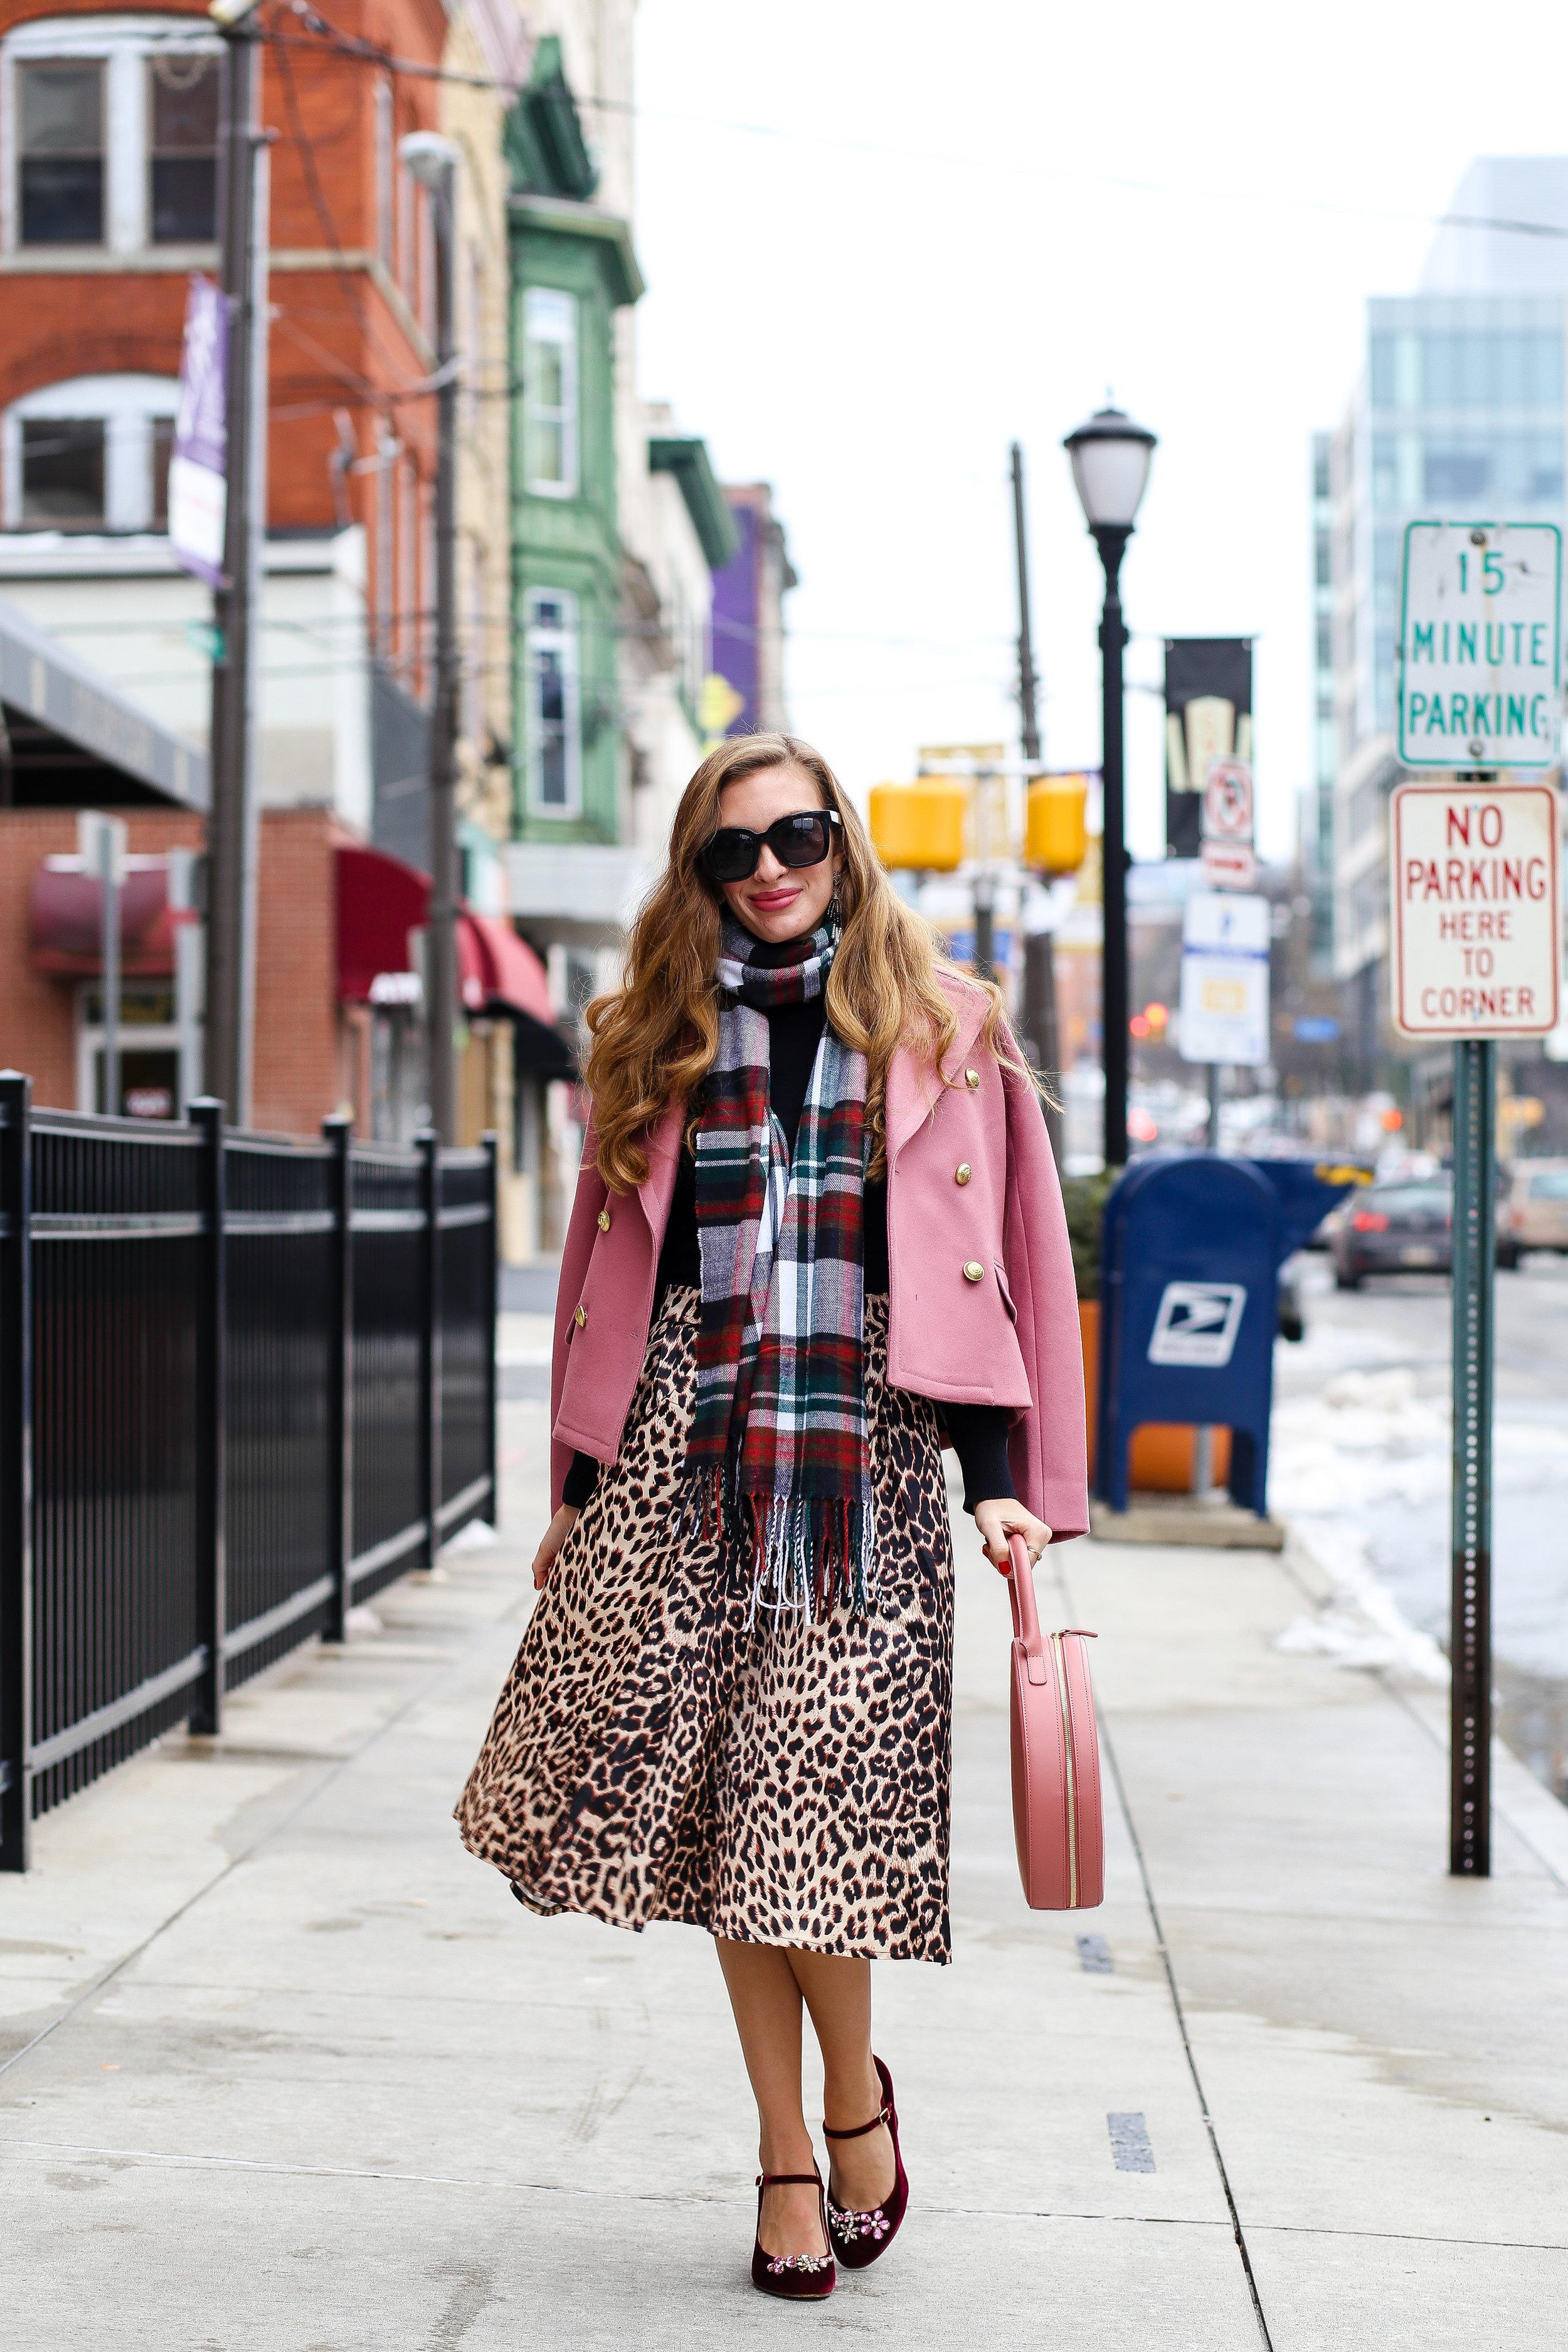 Leopard & Blush- Enchanting Elegance